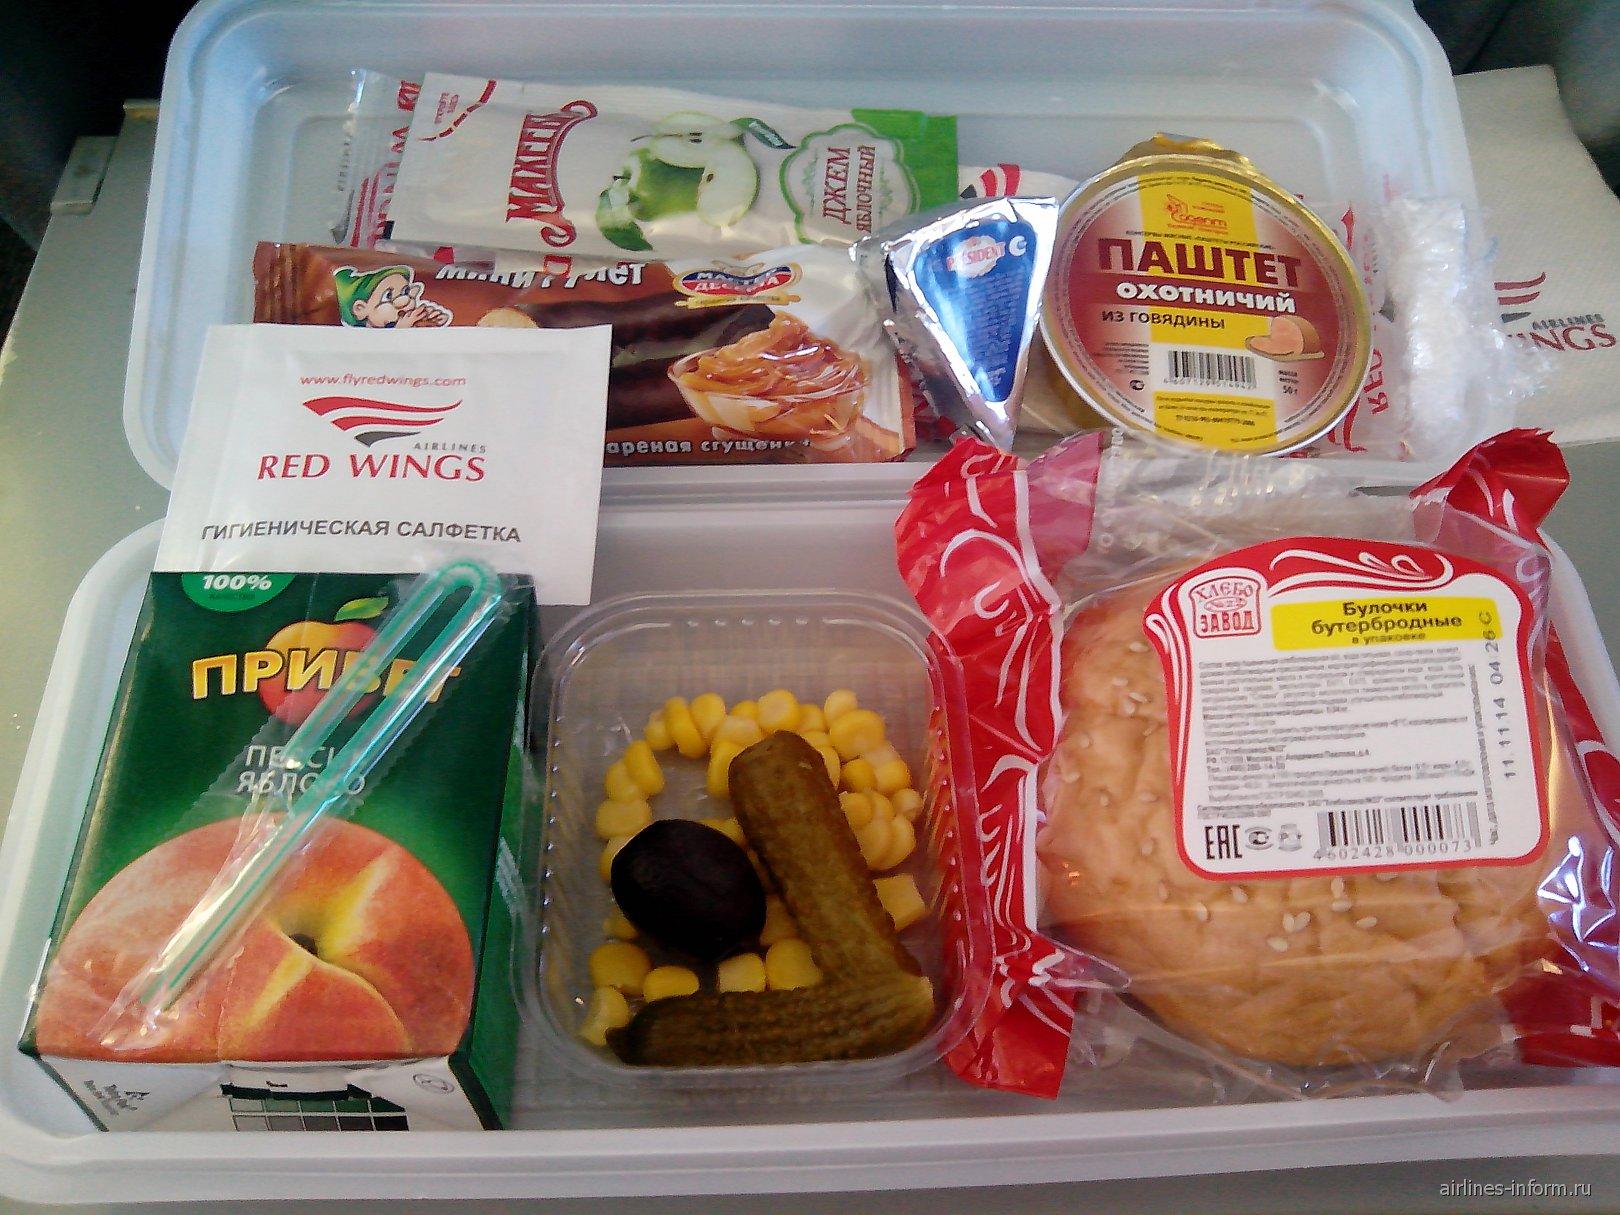 Бортовое питание на рейсе Сочи-Москва авиакомпании Red Wings